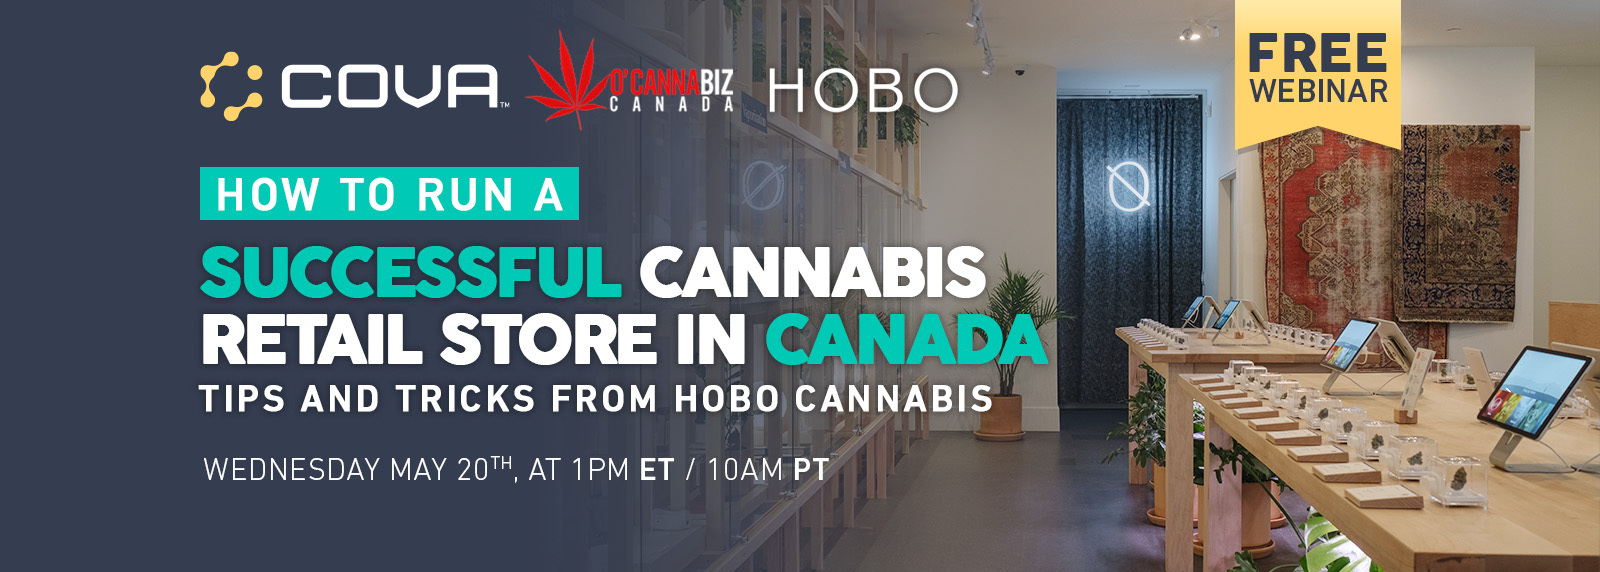 Cova-O'Cannabiz-Webinar-Run-A-Successful-Cannabis-Store